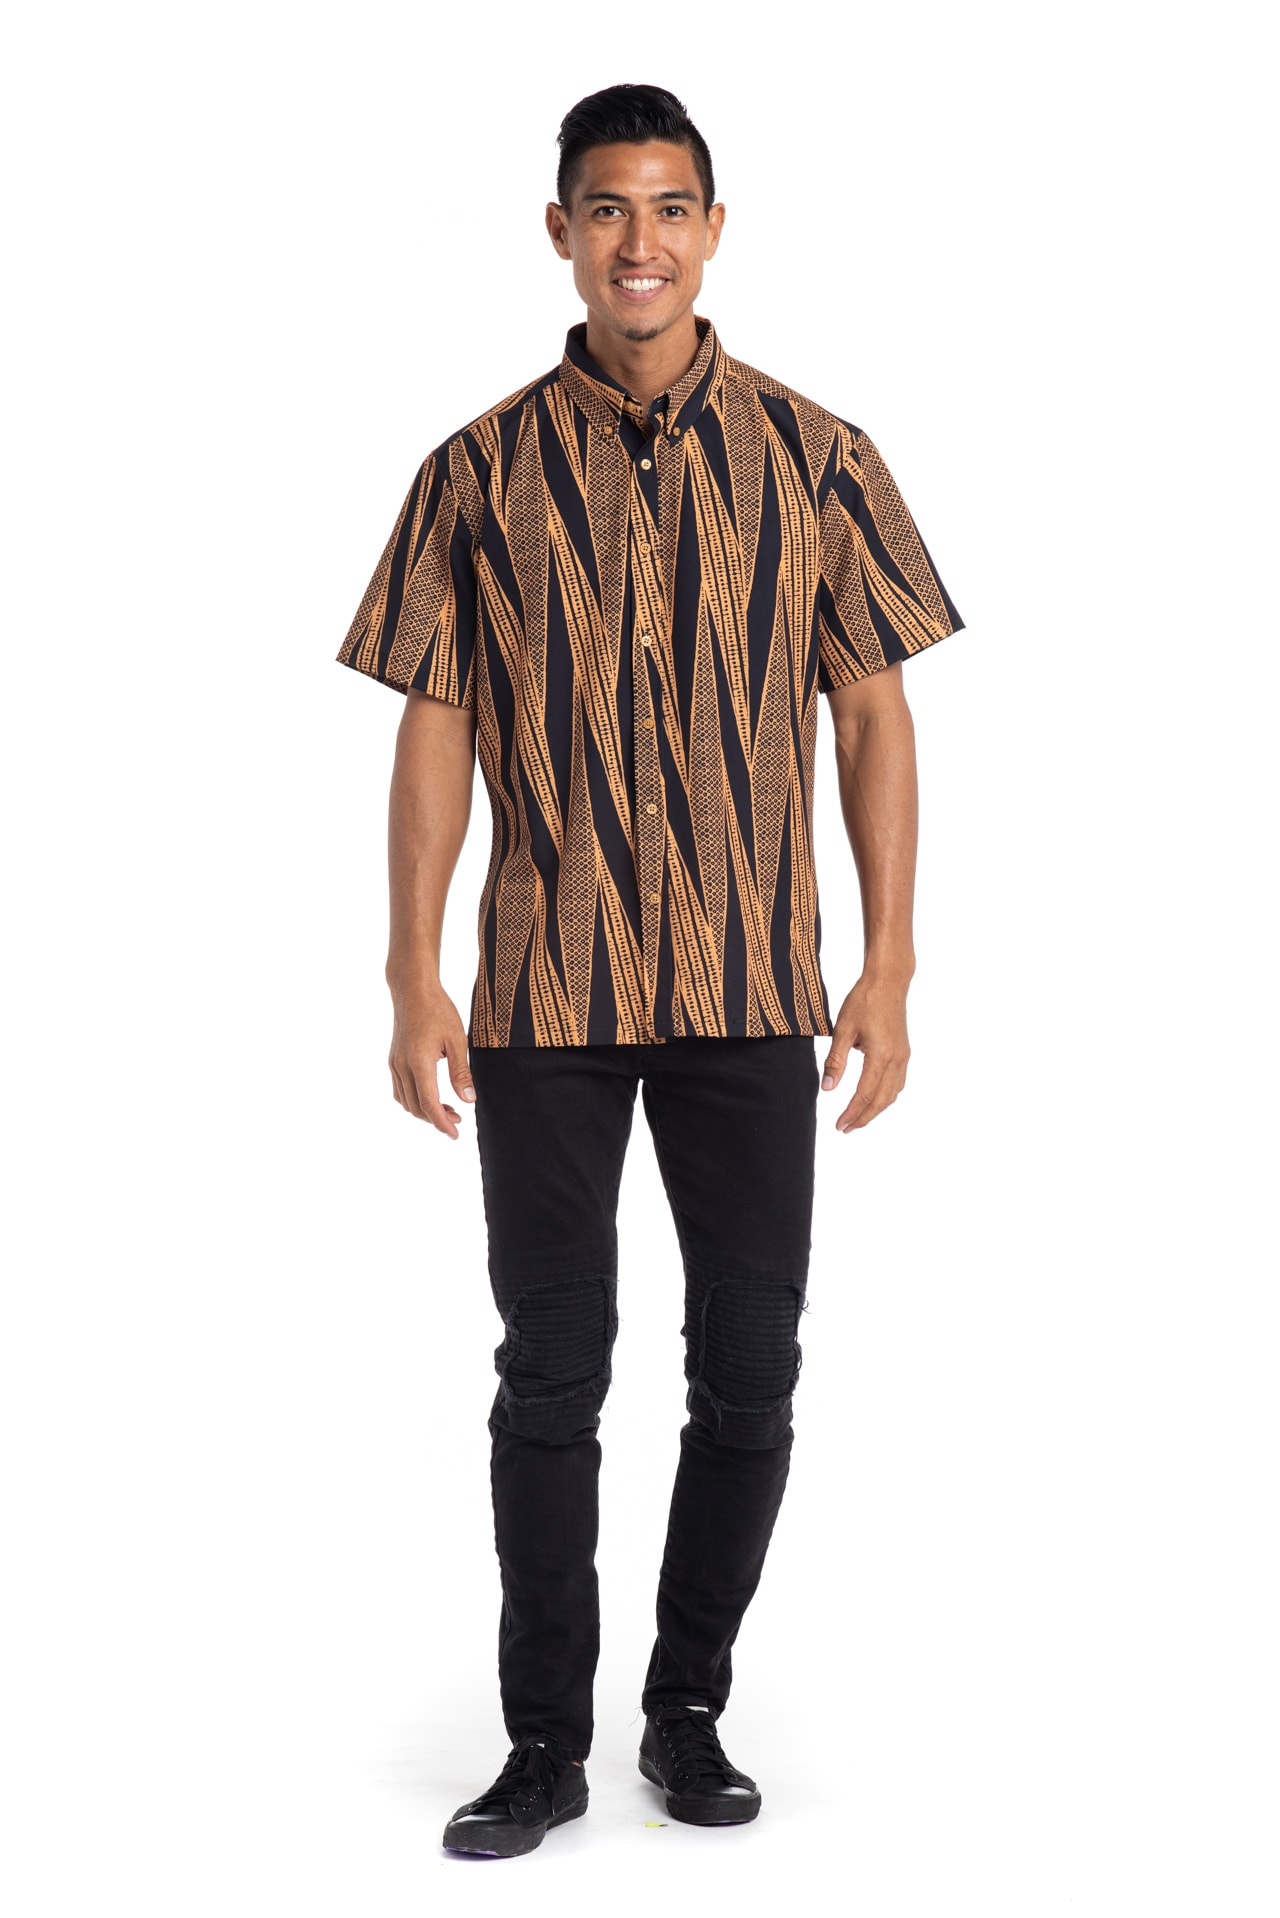 Male model wearing Mahalo Shirt S-S in Deep Well/Buck Skin Kialoa